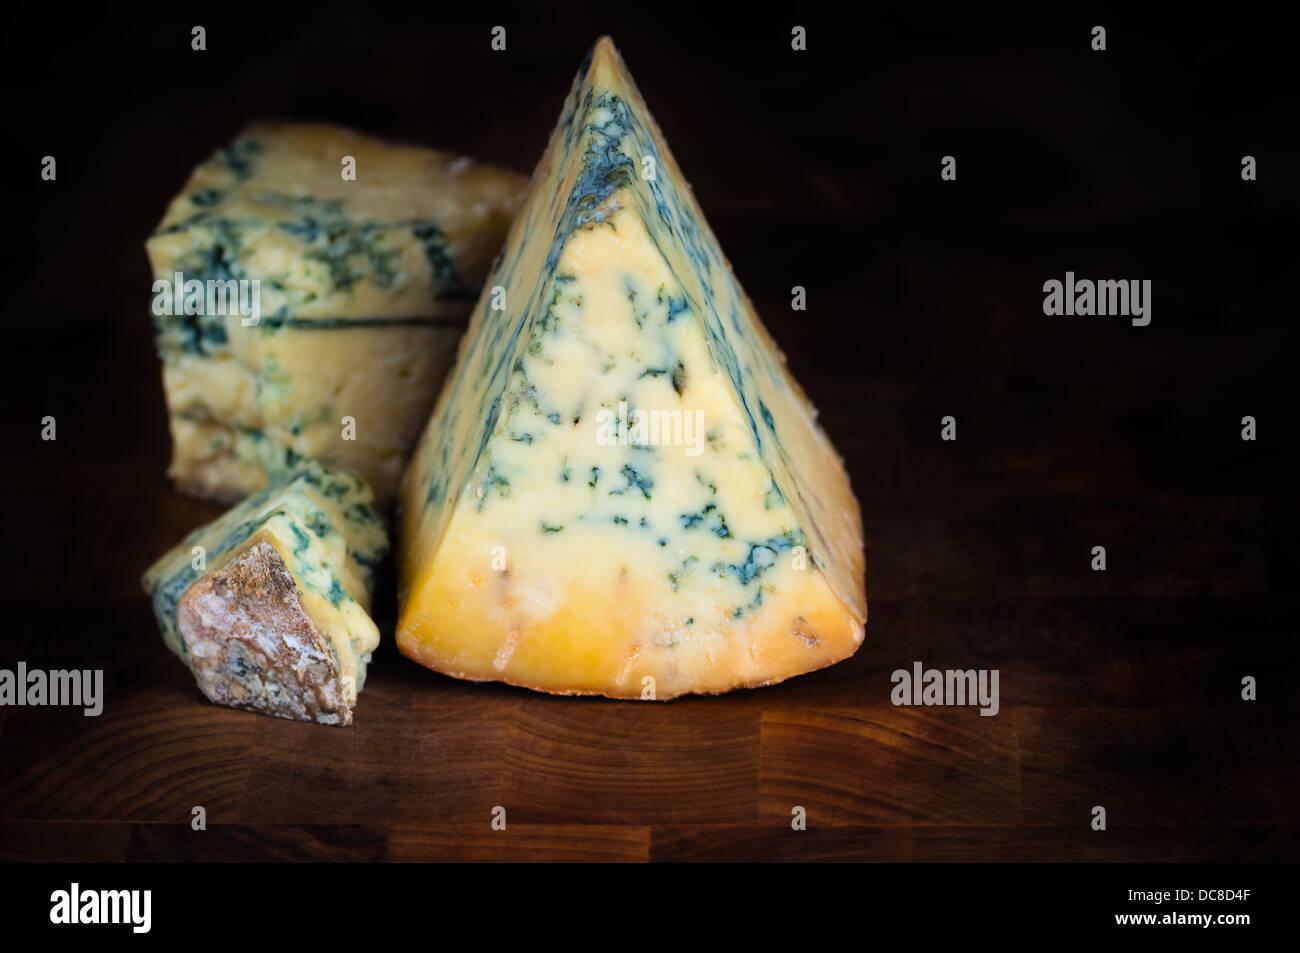 Stilton mature blue cheese - Dark background - Stock Image